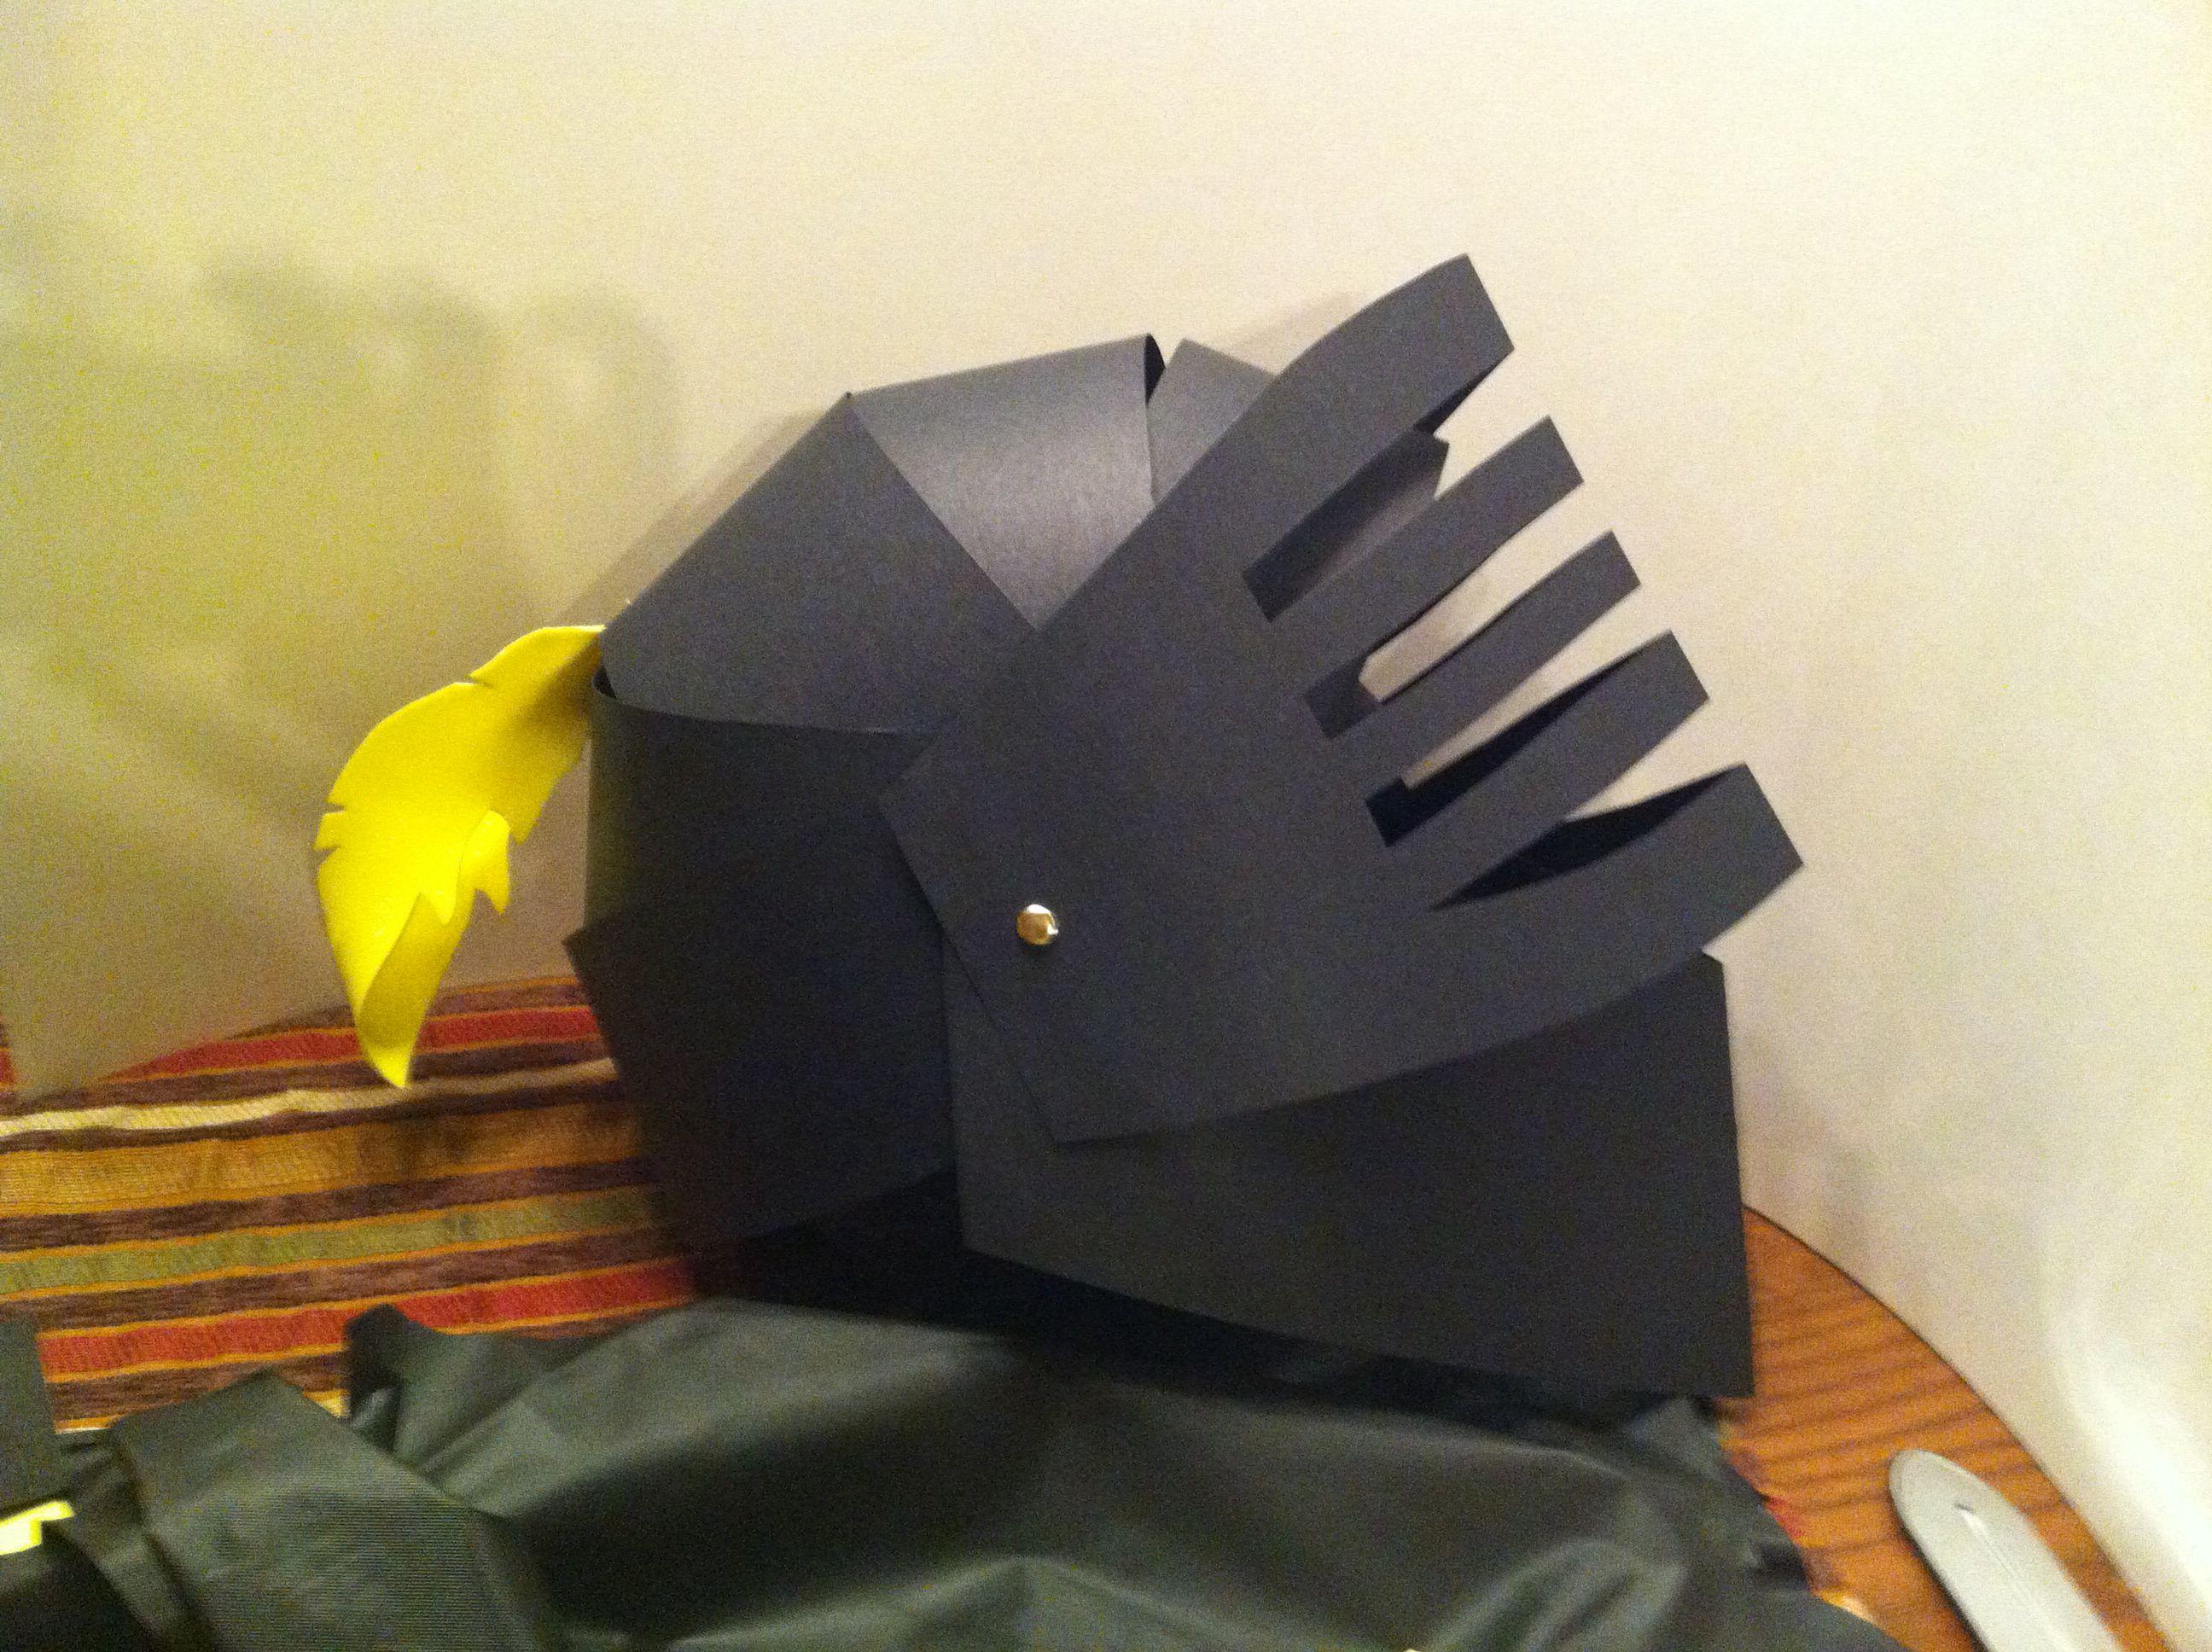 diy knight helmet costumes pinterest fasching ritterkost m und kost m. Black Bedroom Furniture Sets. Home Design Ideas